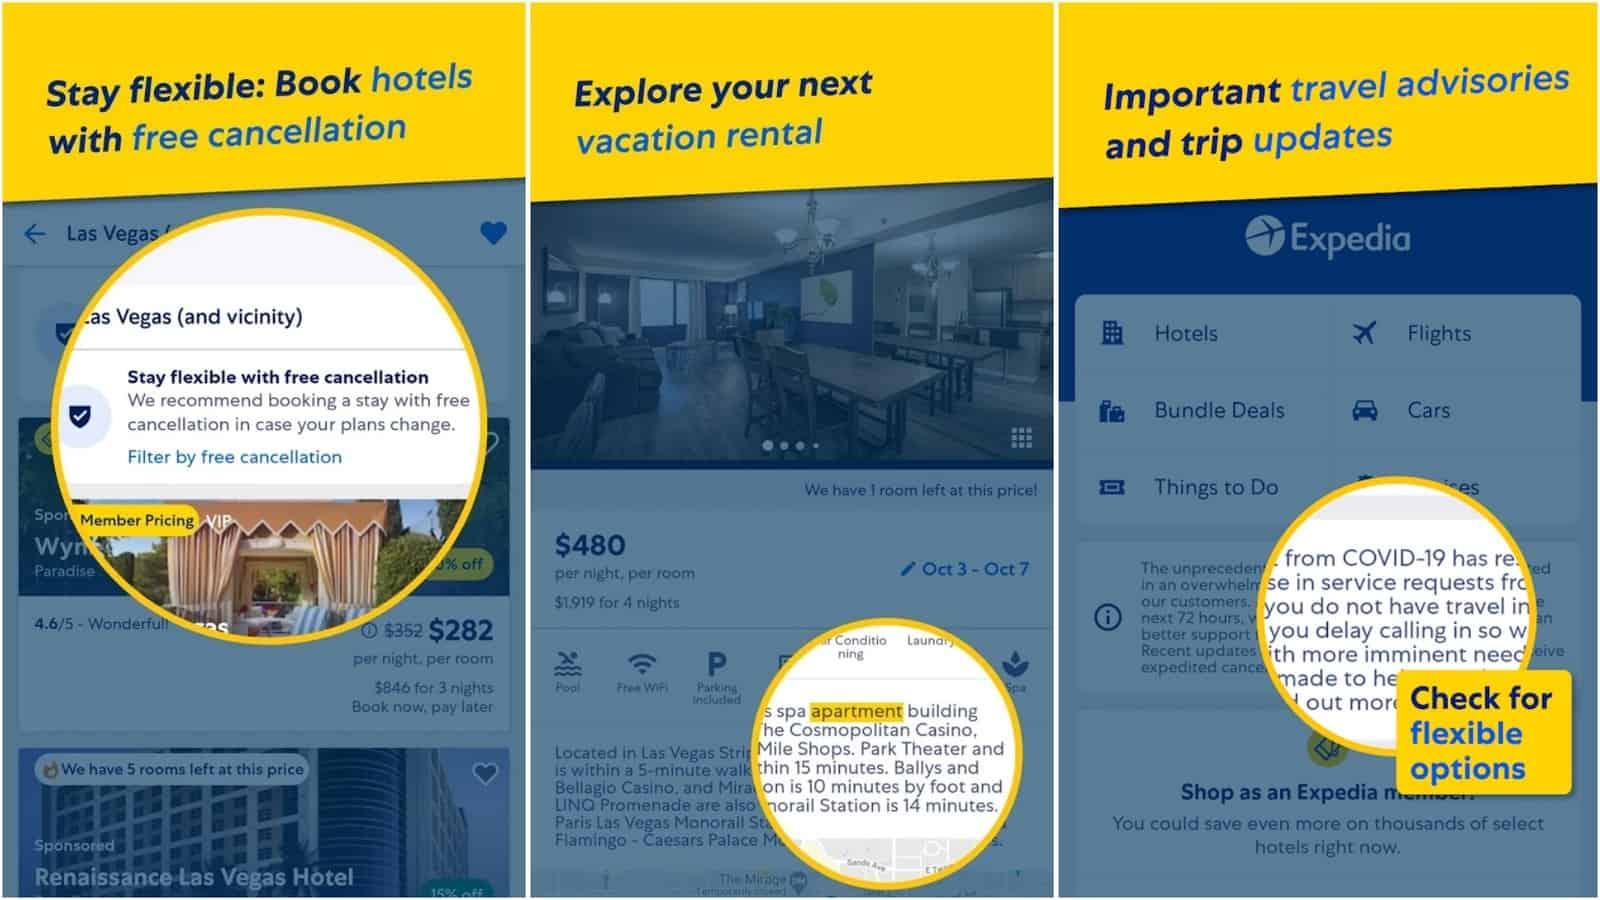 Expedia Hotels app grid image